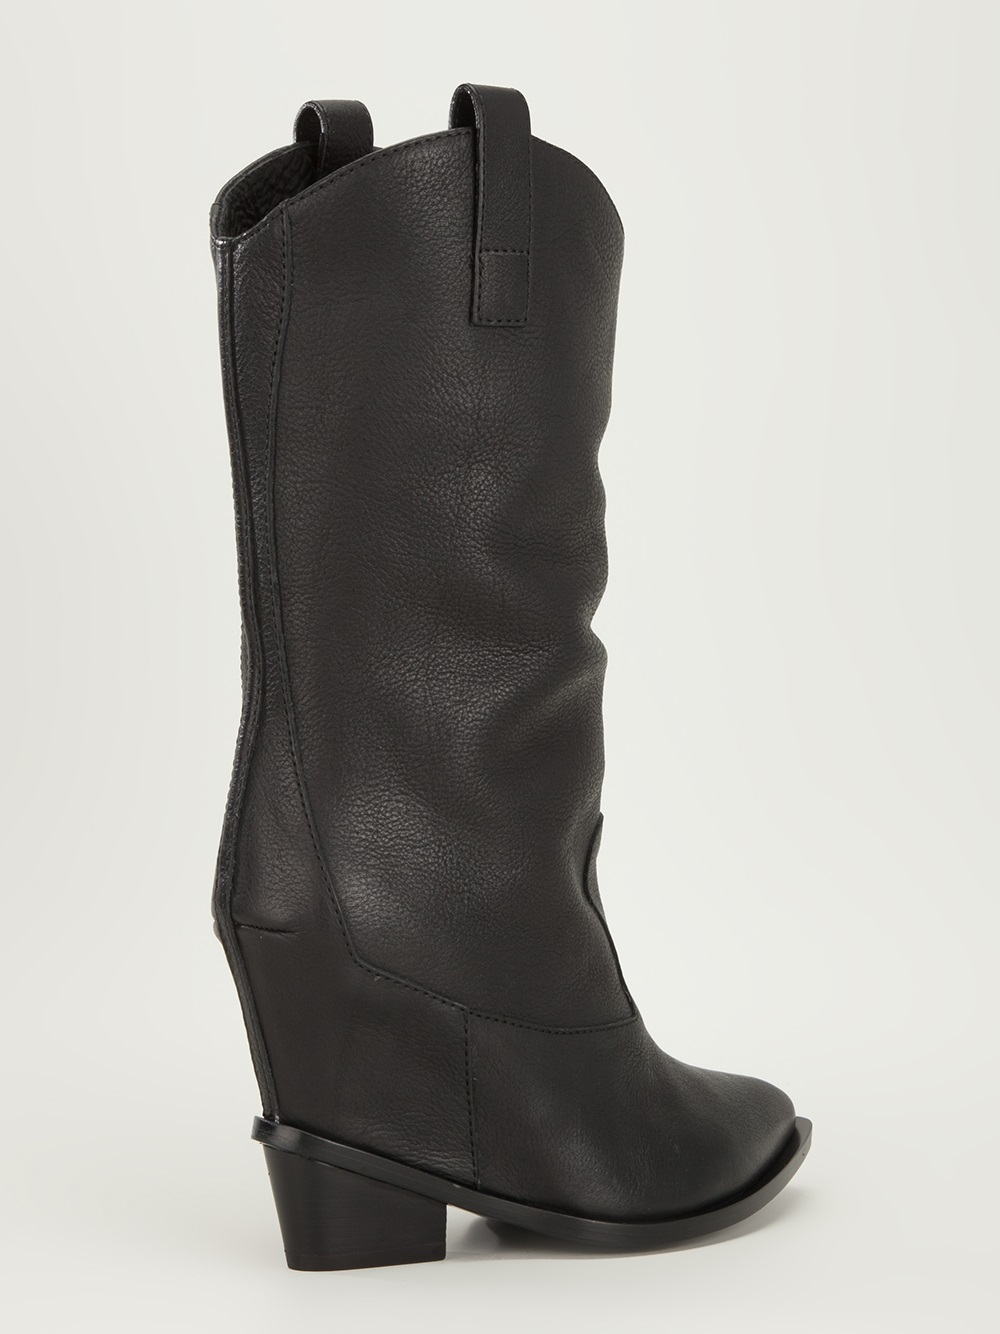 03a5266be2ed Lyst - Giuseppe Zanotti Wedge Cowboy Boot in Black